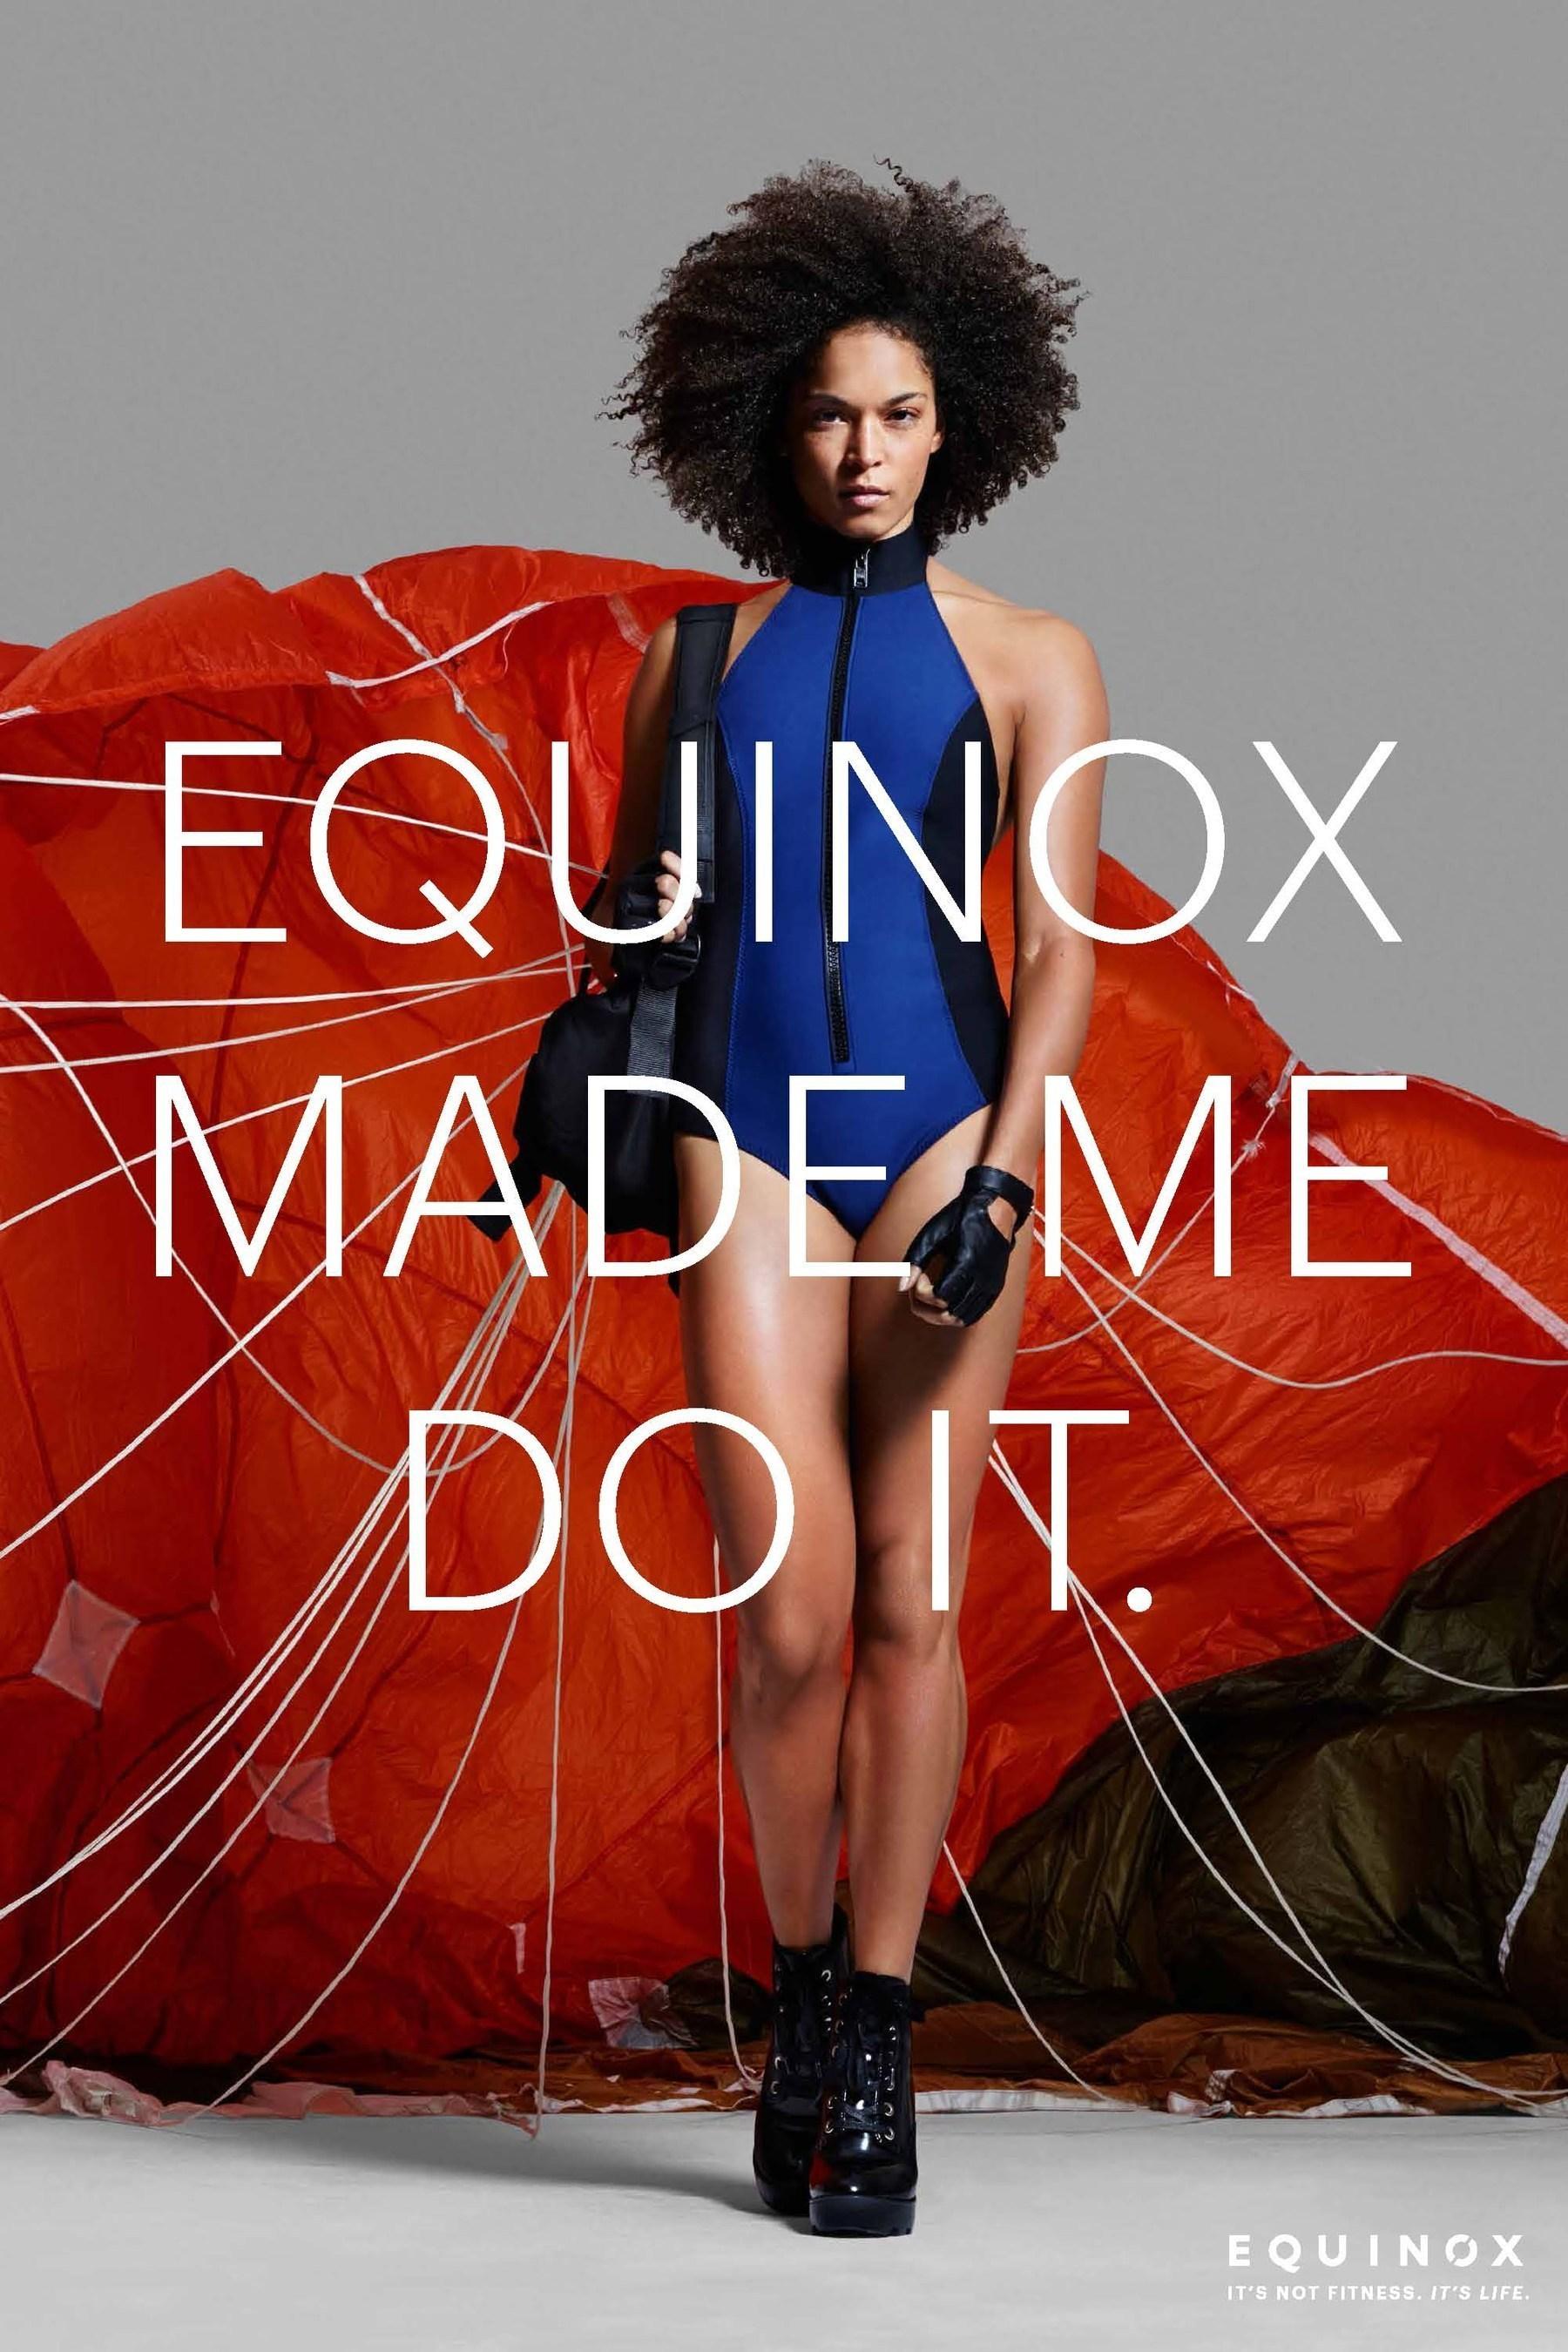 @Equinox #EquinoxMadeMeDoIt